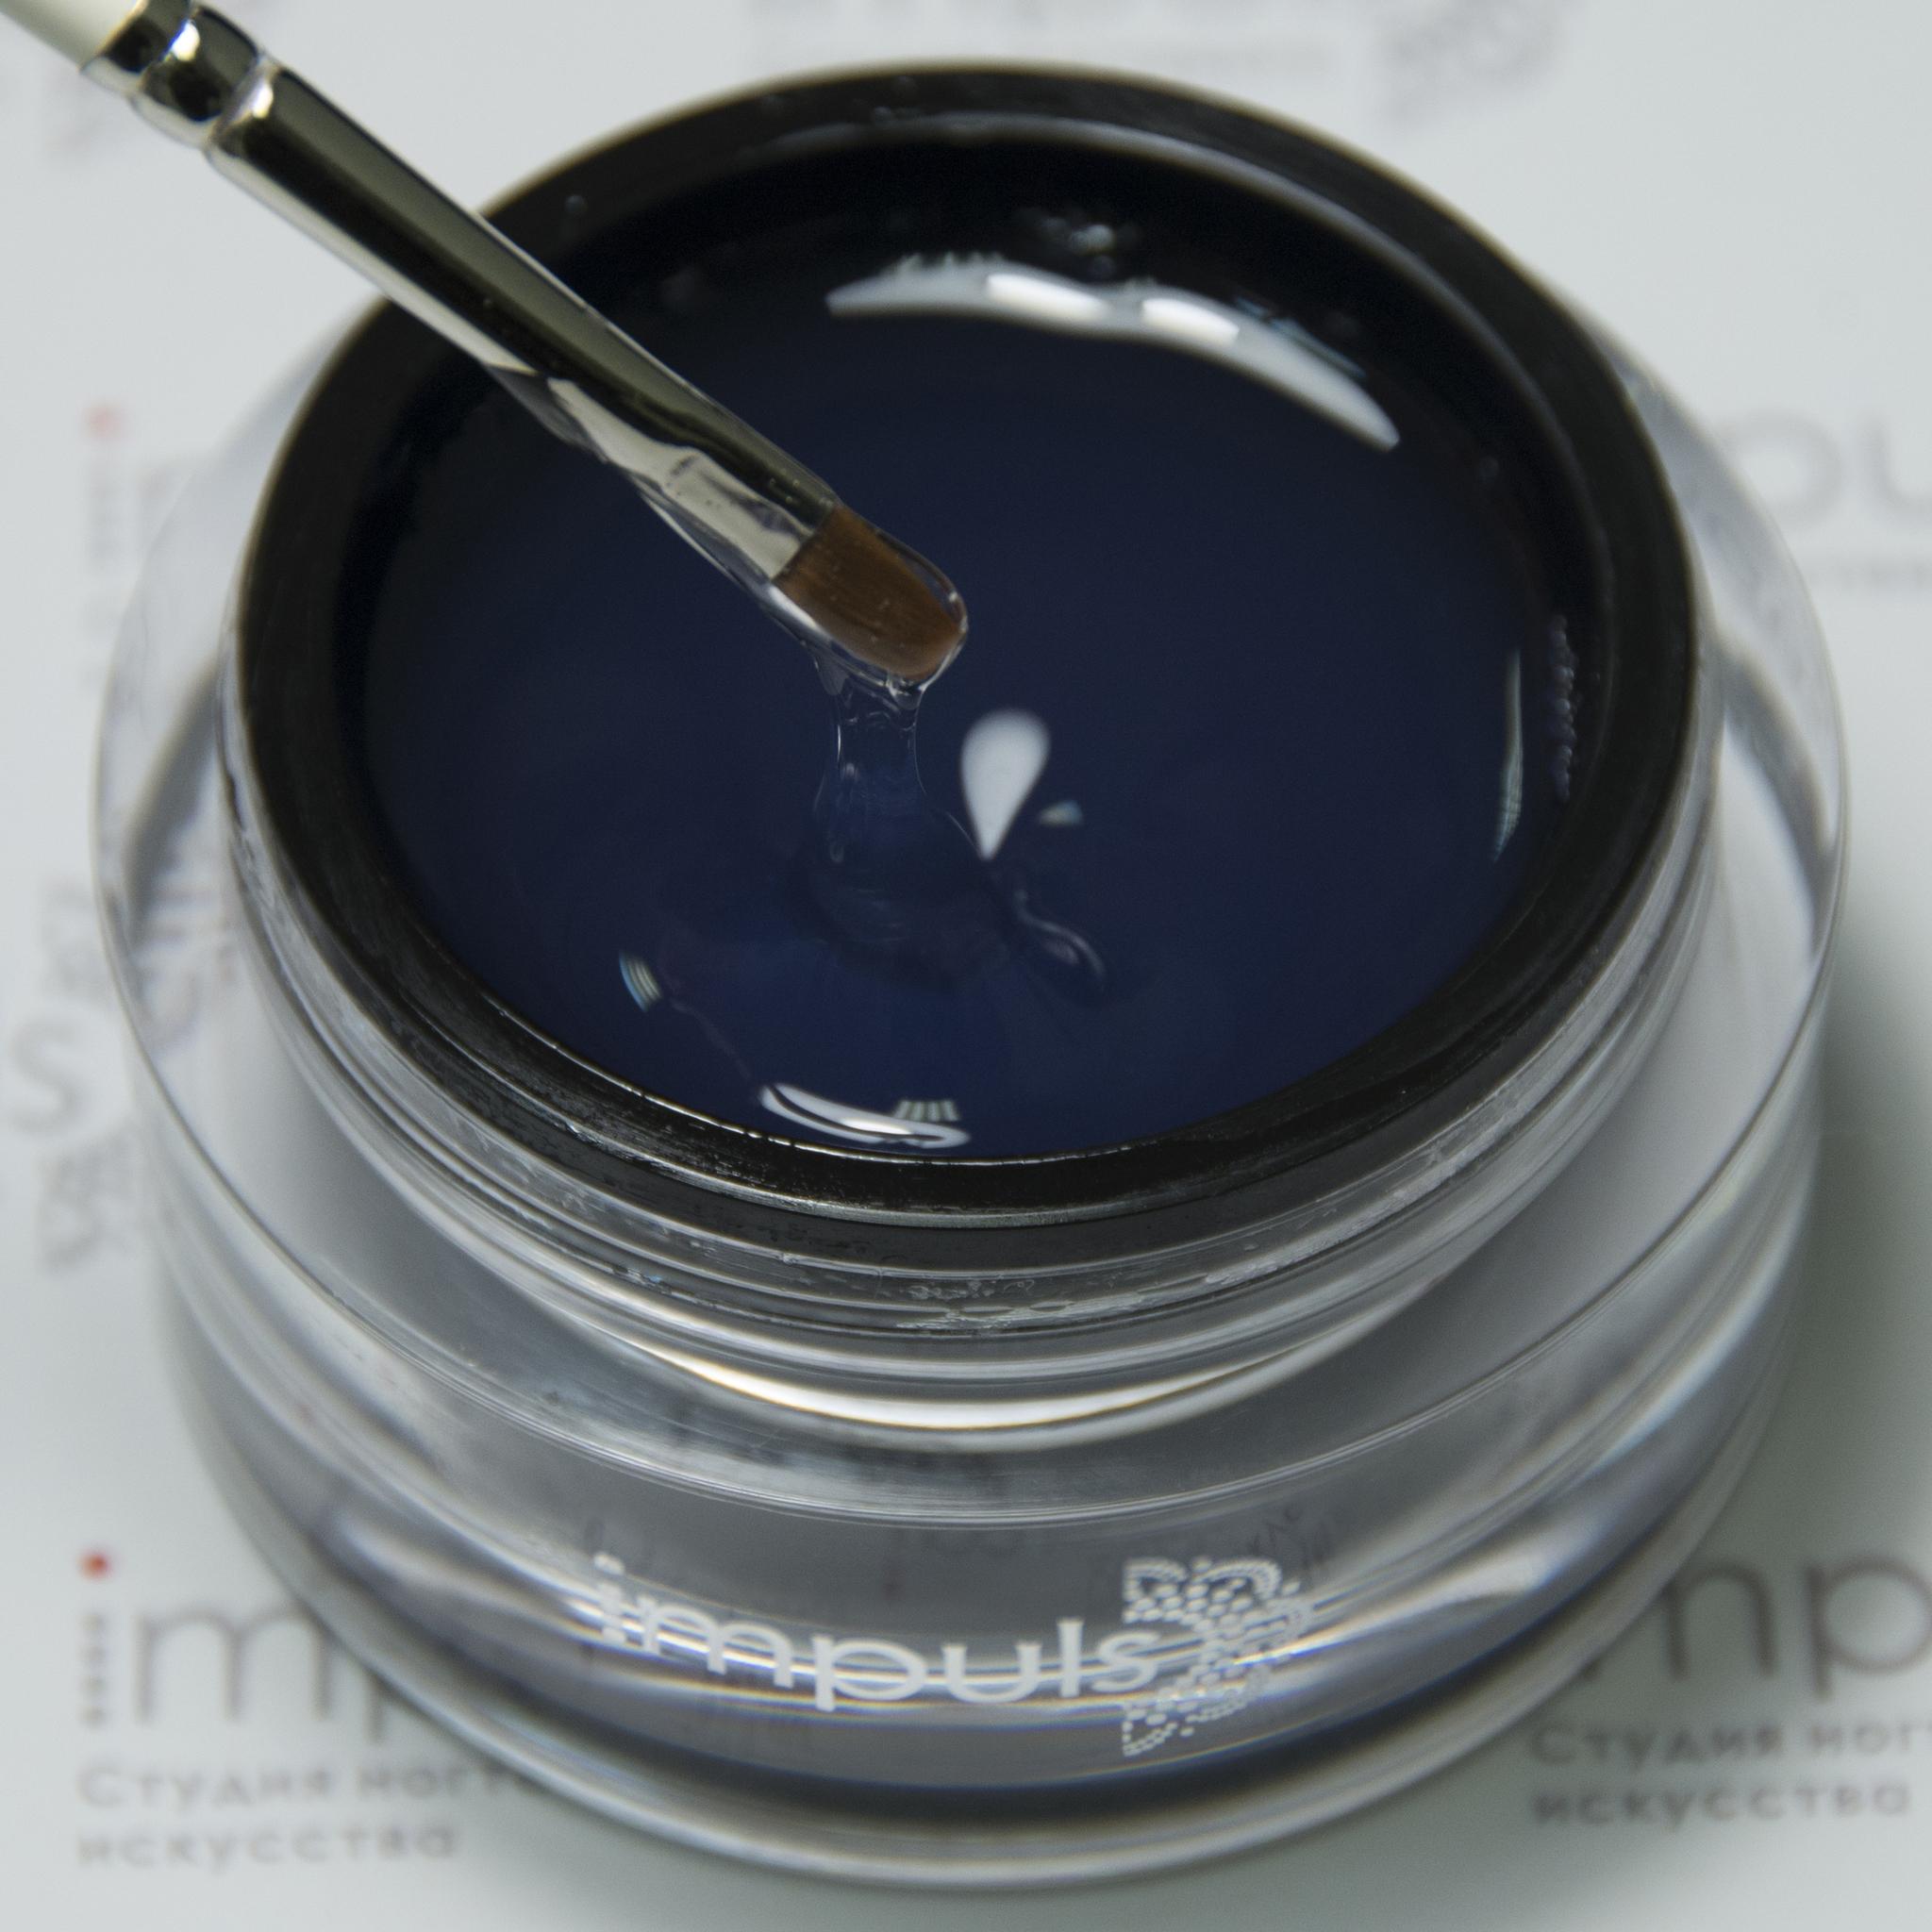 Exklusiv Ein-Phasen Violett Clear Gel. Однофазный гель прозрачно-фиолетовый